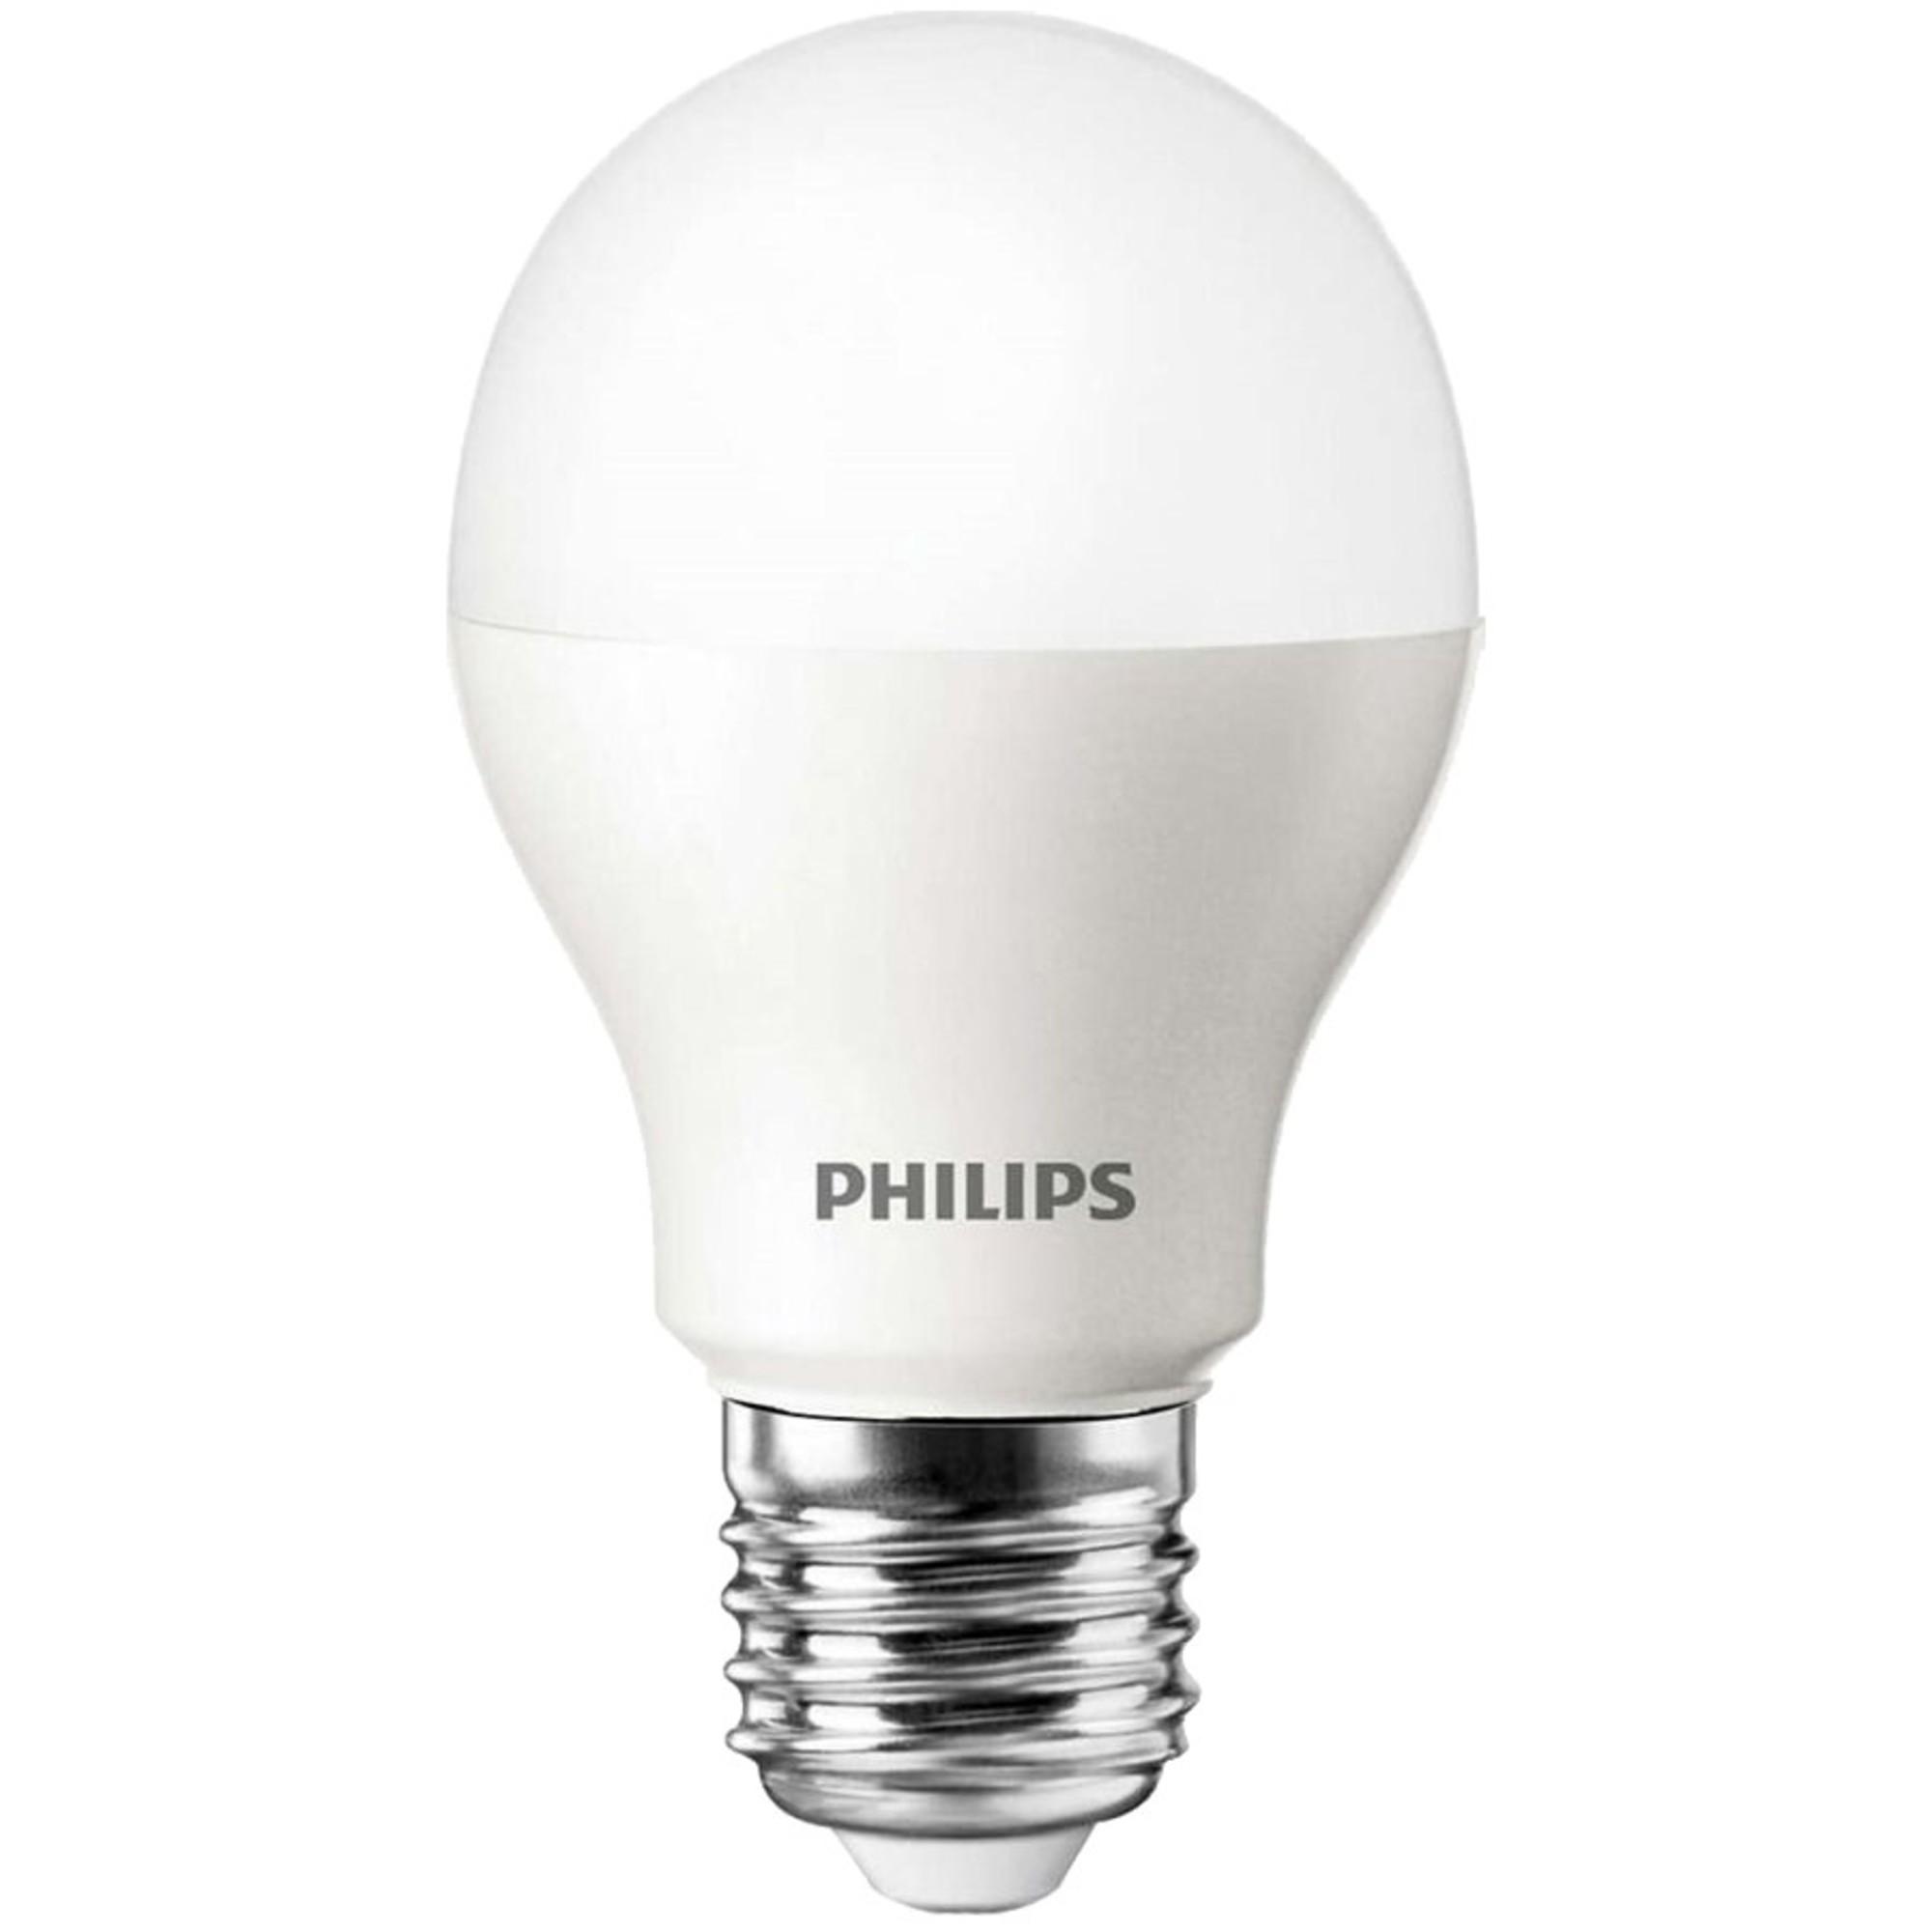 Лампа Philips Essential светодионая E27 11 Вт груша 1150 Лм теплый свет